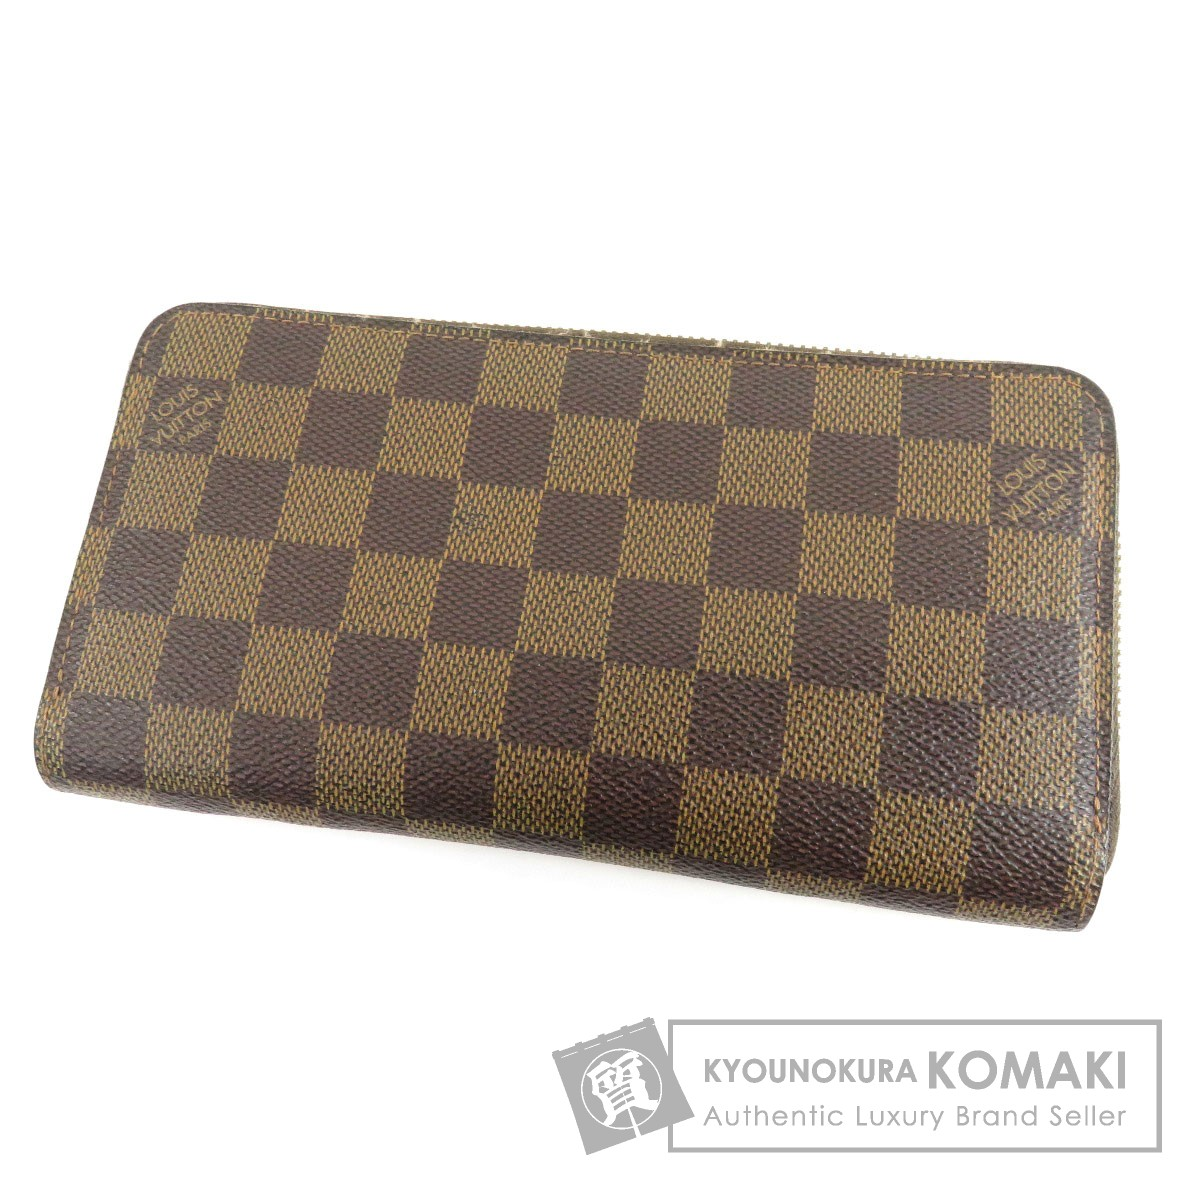 LOUIS VUITTON N60015 ジッピーウォレット 旧型 長財布(小銭入れあり) ダミエキャンバス レディース 【中古】【ルイ・ヴィトン】